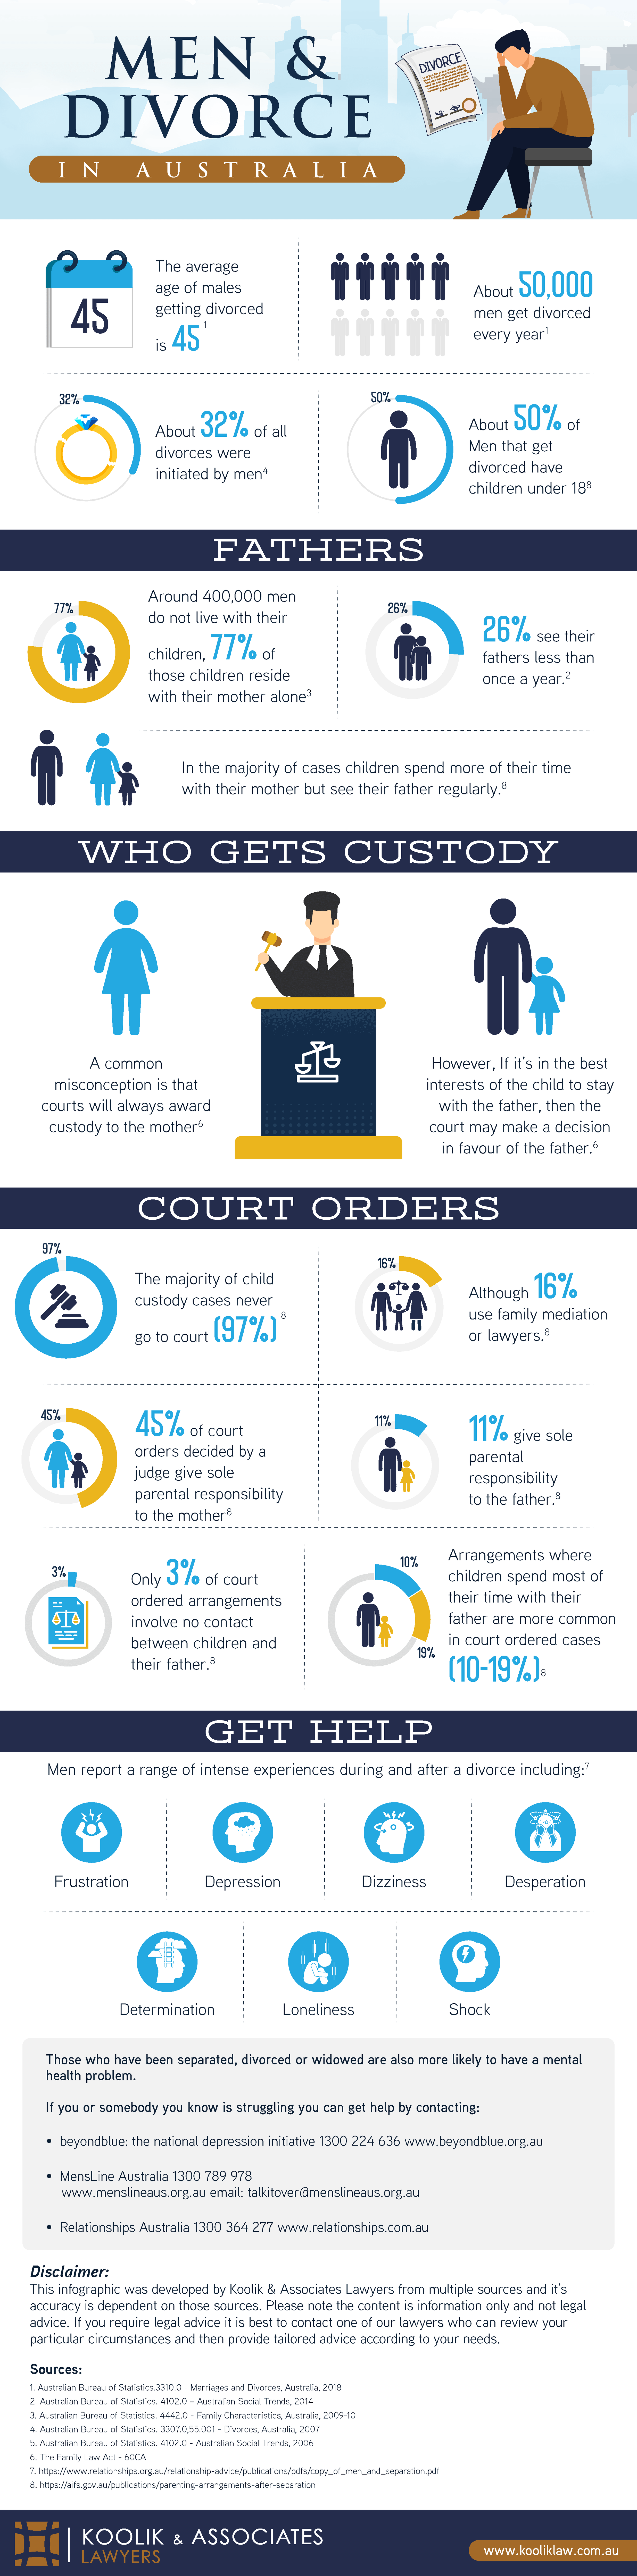 Men & Divorce in Australia